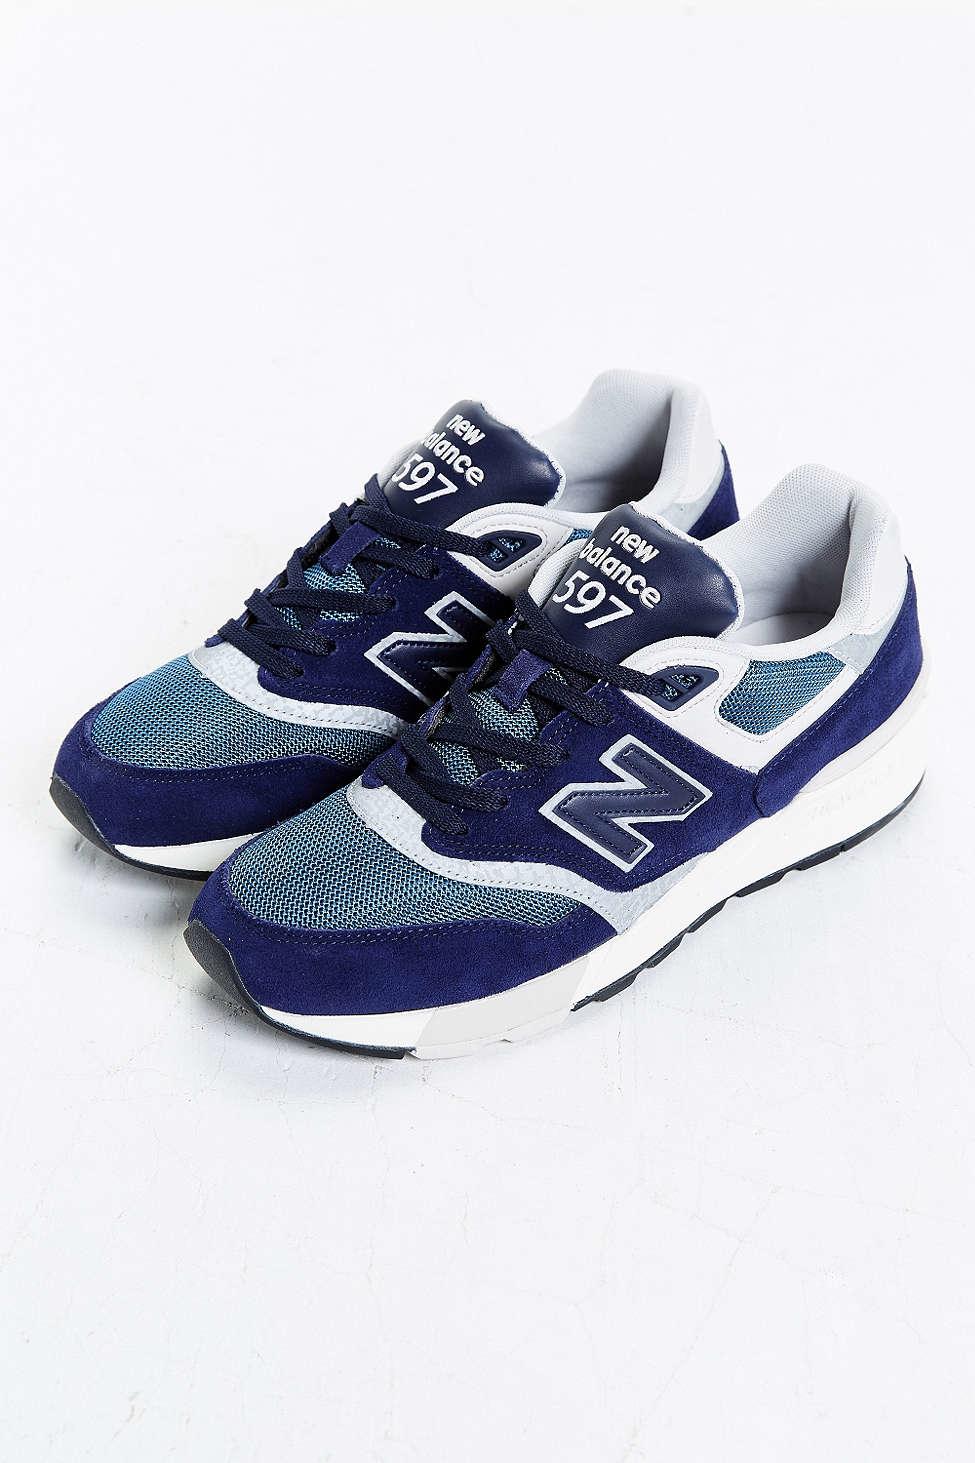 check out dbd1b 96e86 New Balance Blue 597 Sneaker for men